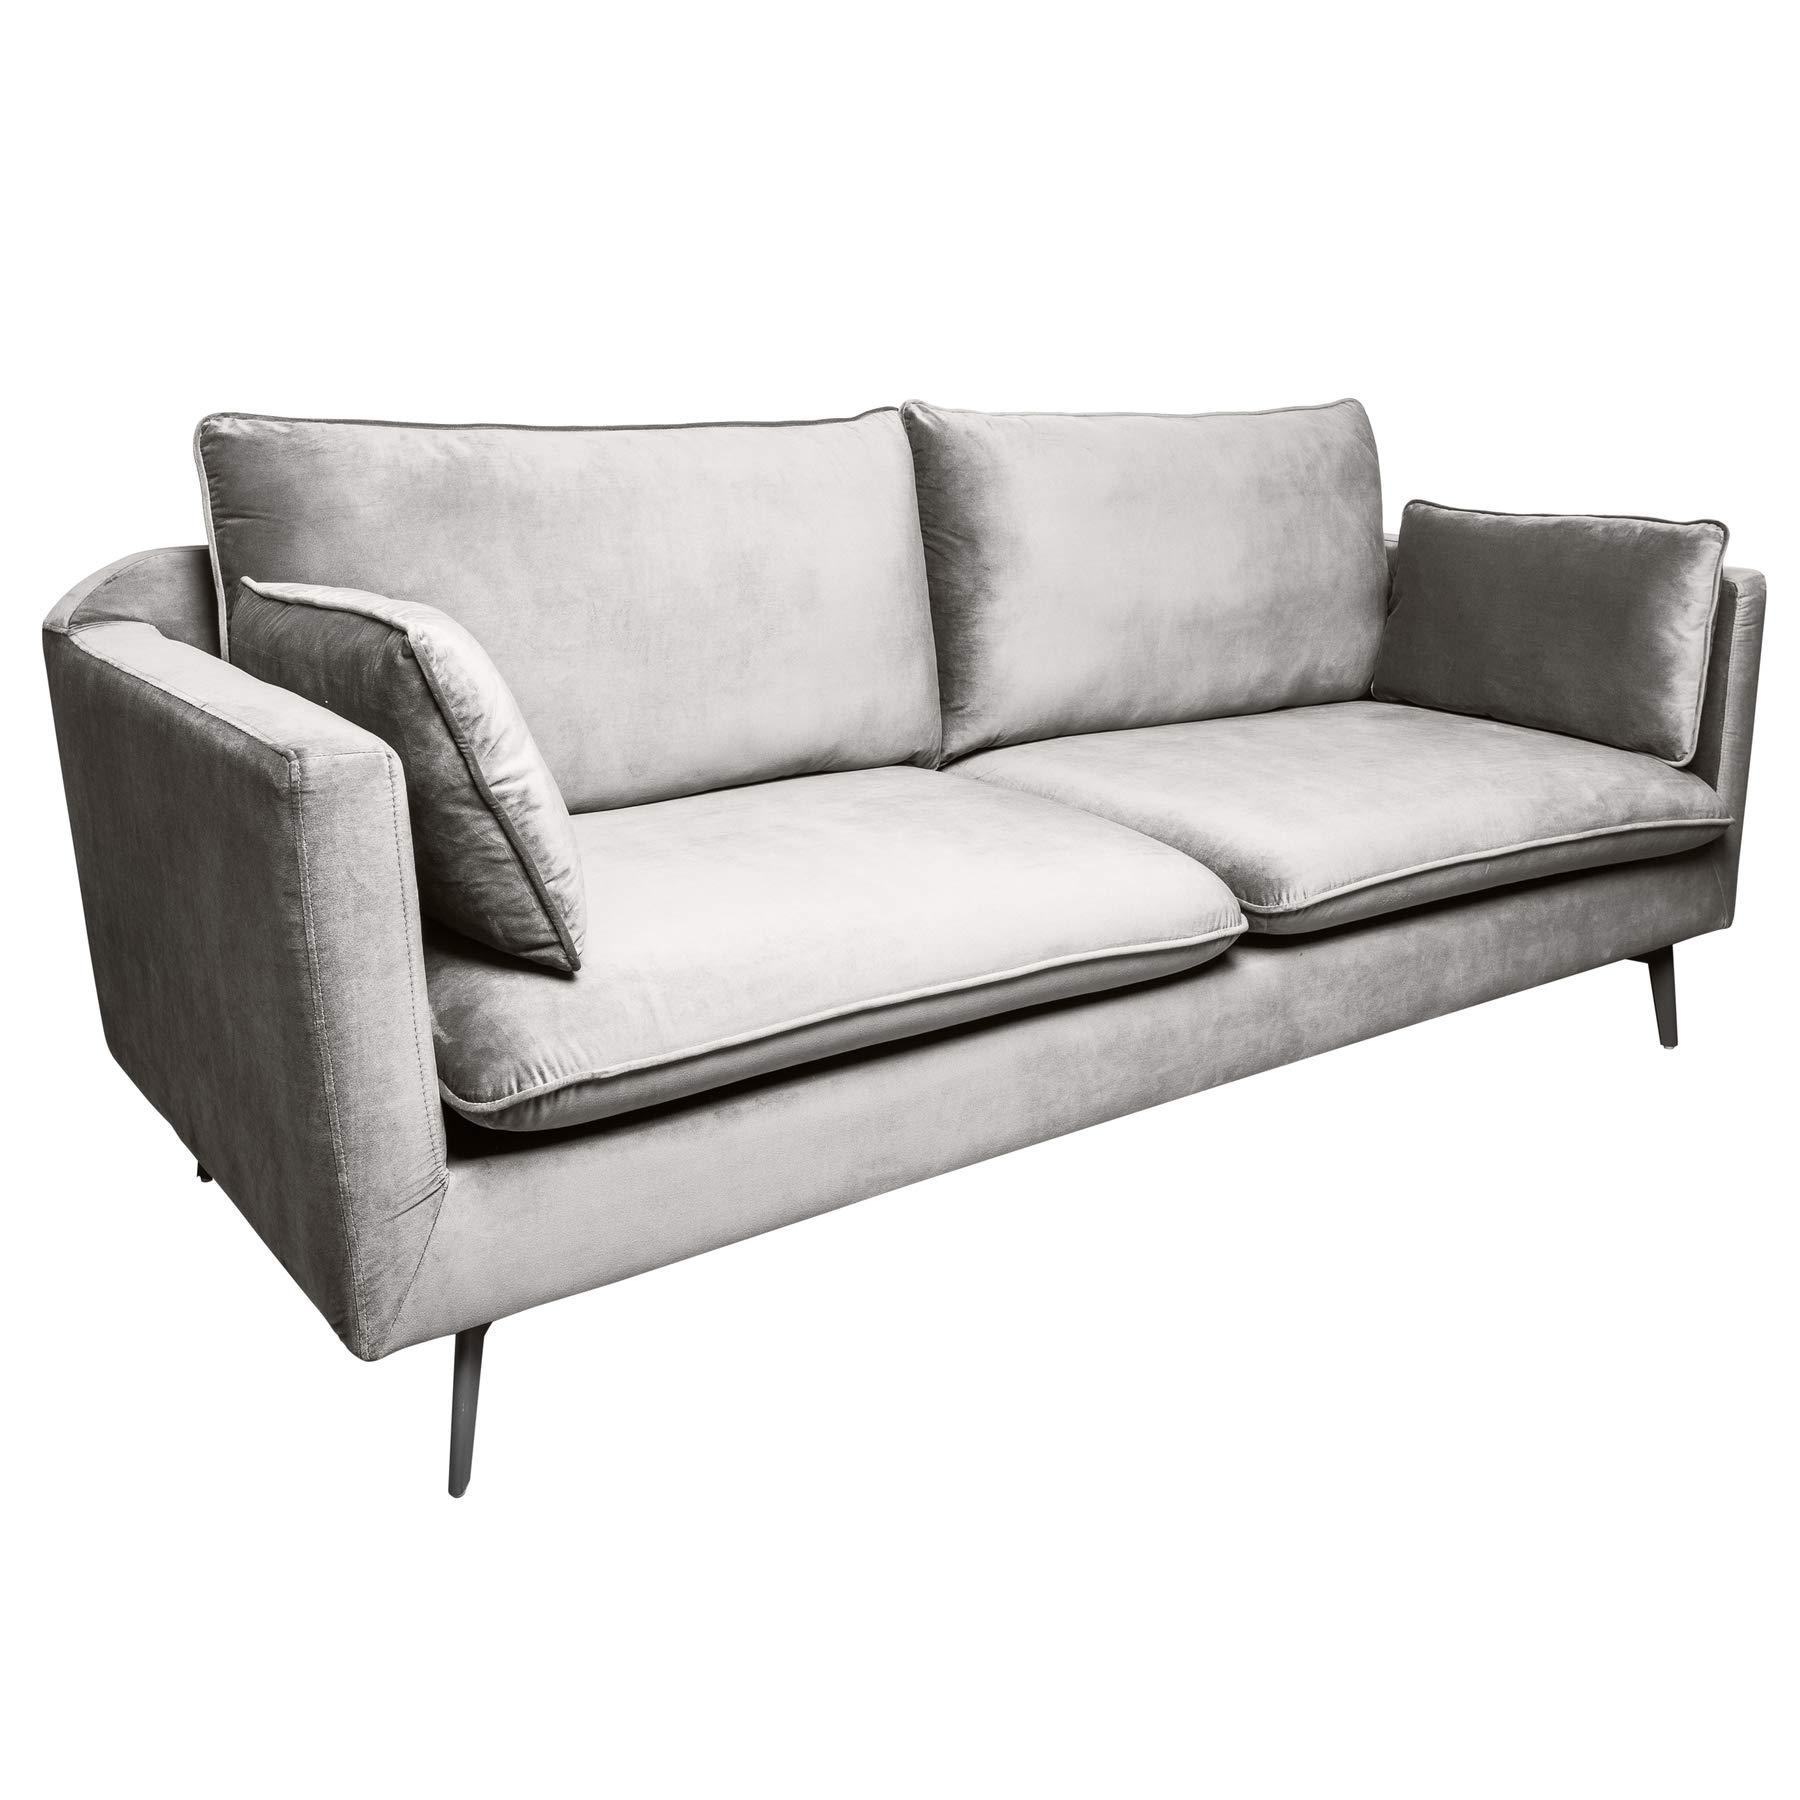 Full Size of 3er Sofa Riess Ambiente Design Famous Silbergrau 210cm Samt Big Grau Xora Schlaf Mit Led Reiniger 3 Sitzer Chesterfield Günstig Relaxfunktion Schlaffunktion Sofa 3er Sofa